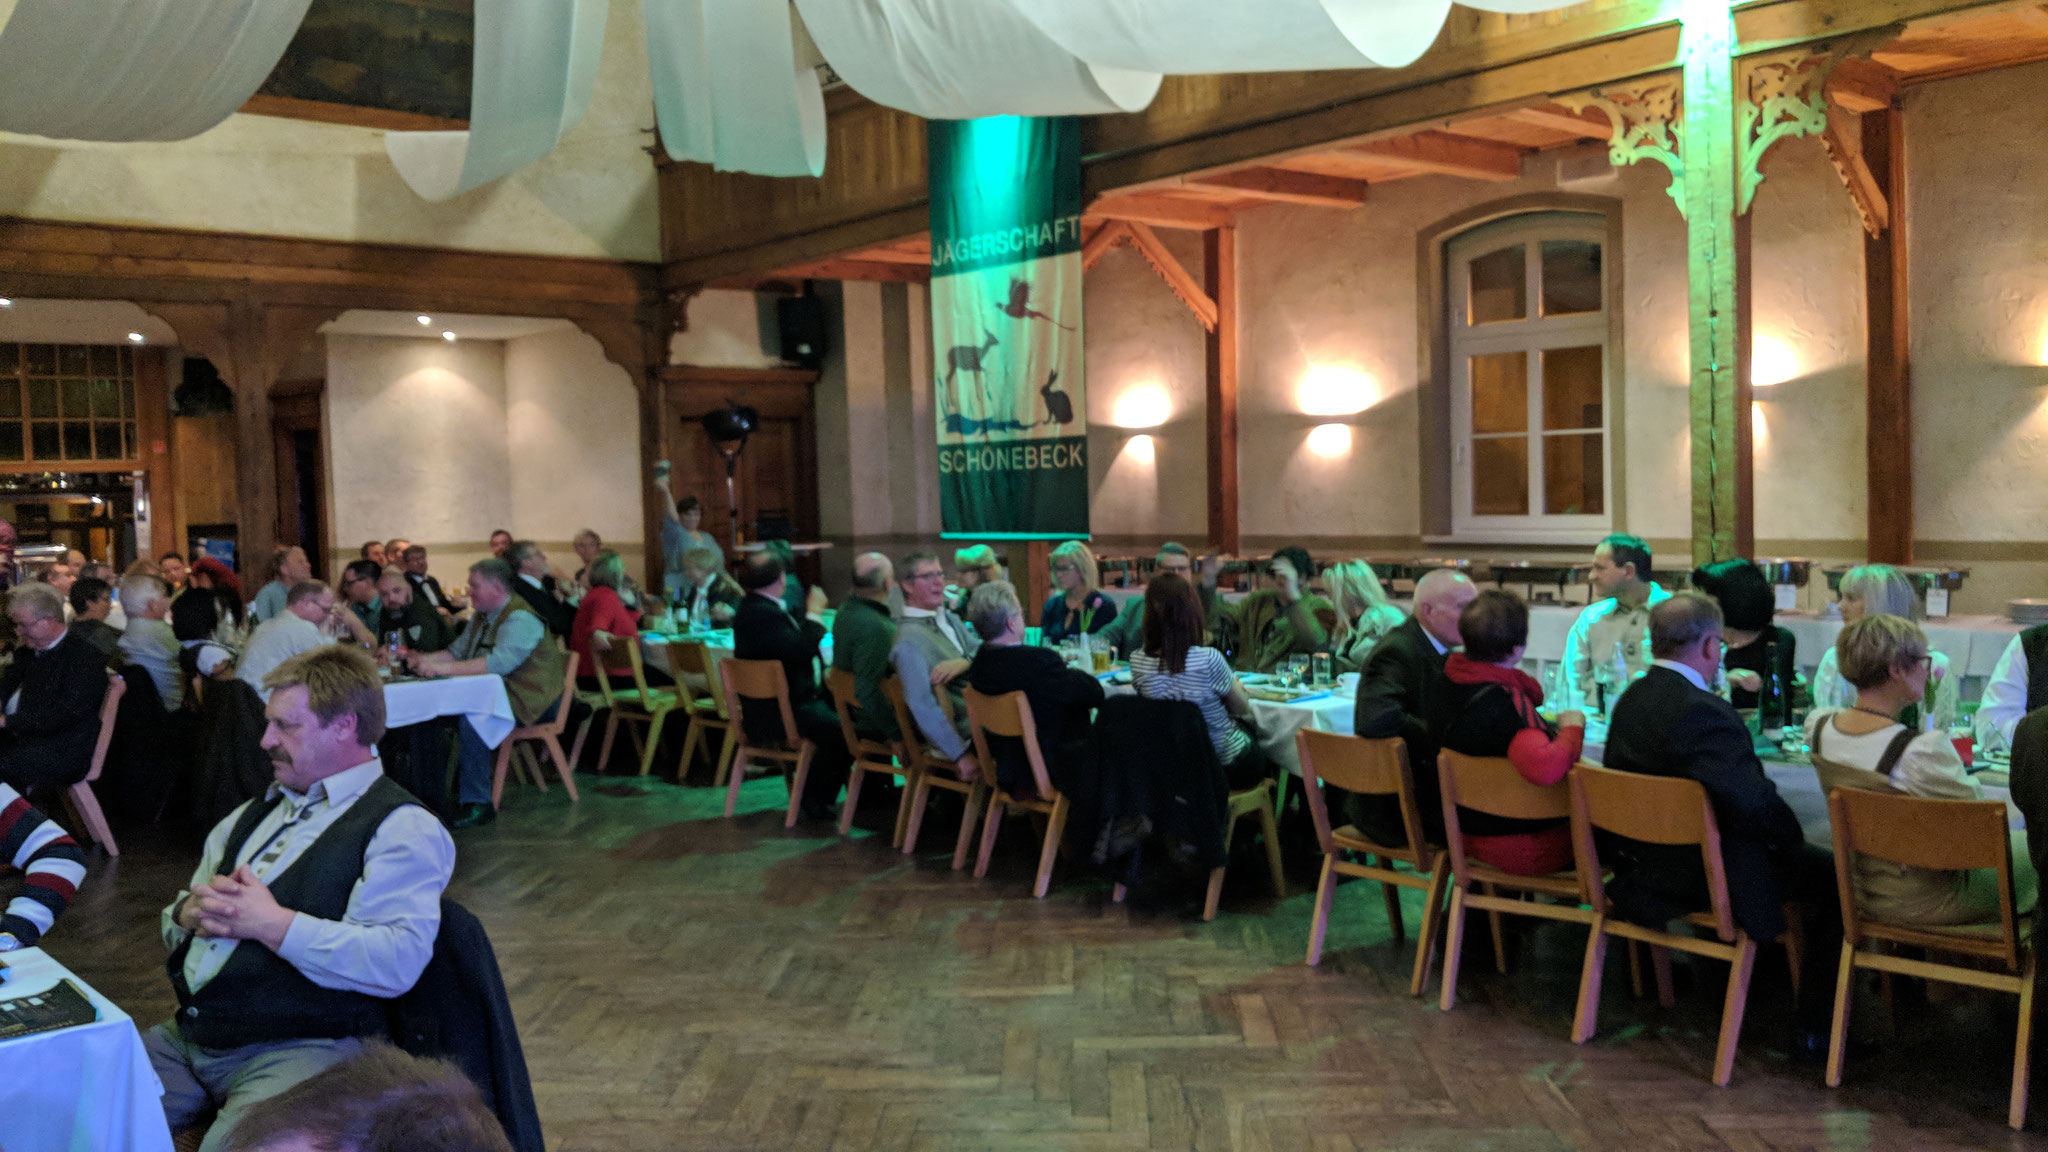 Jägerball 2018 der Jägerschaft Schönebeck